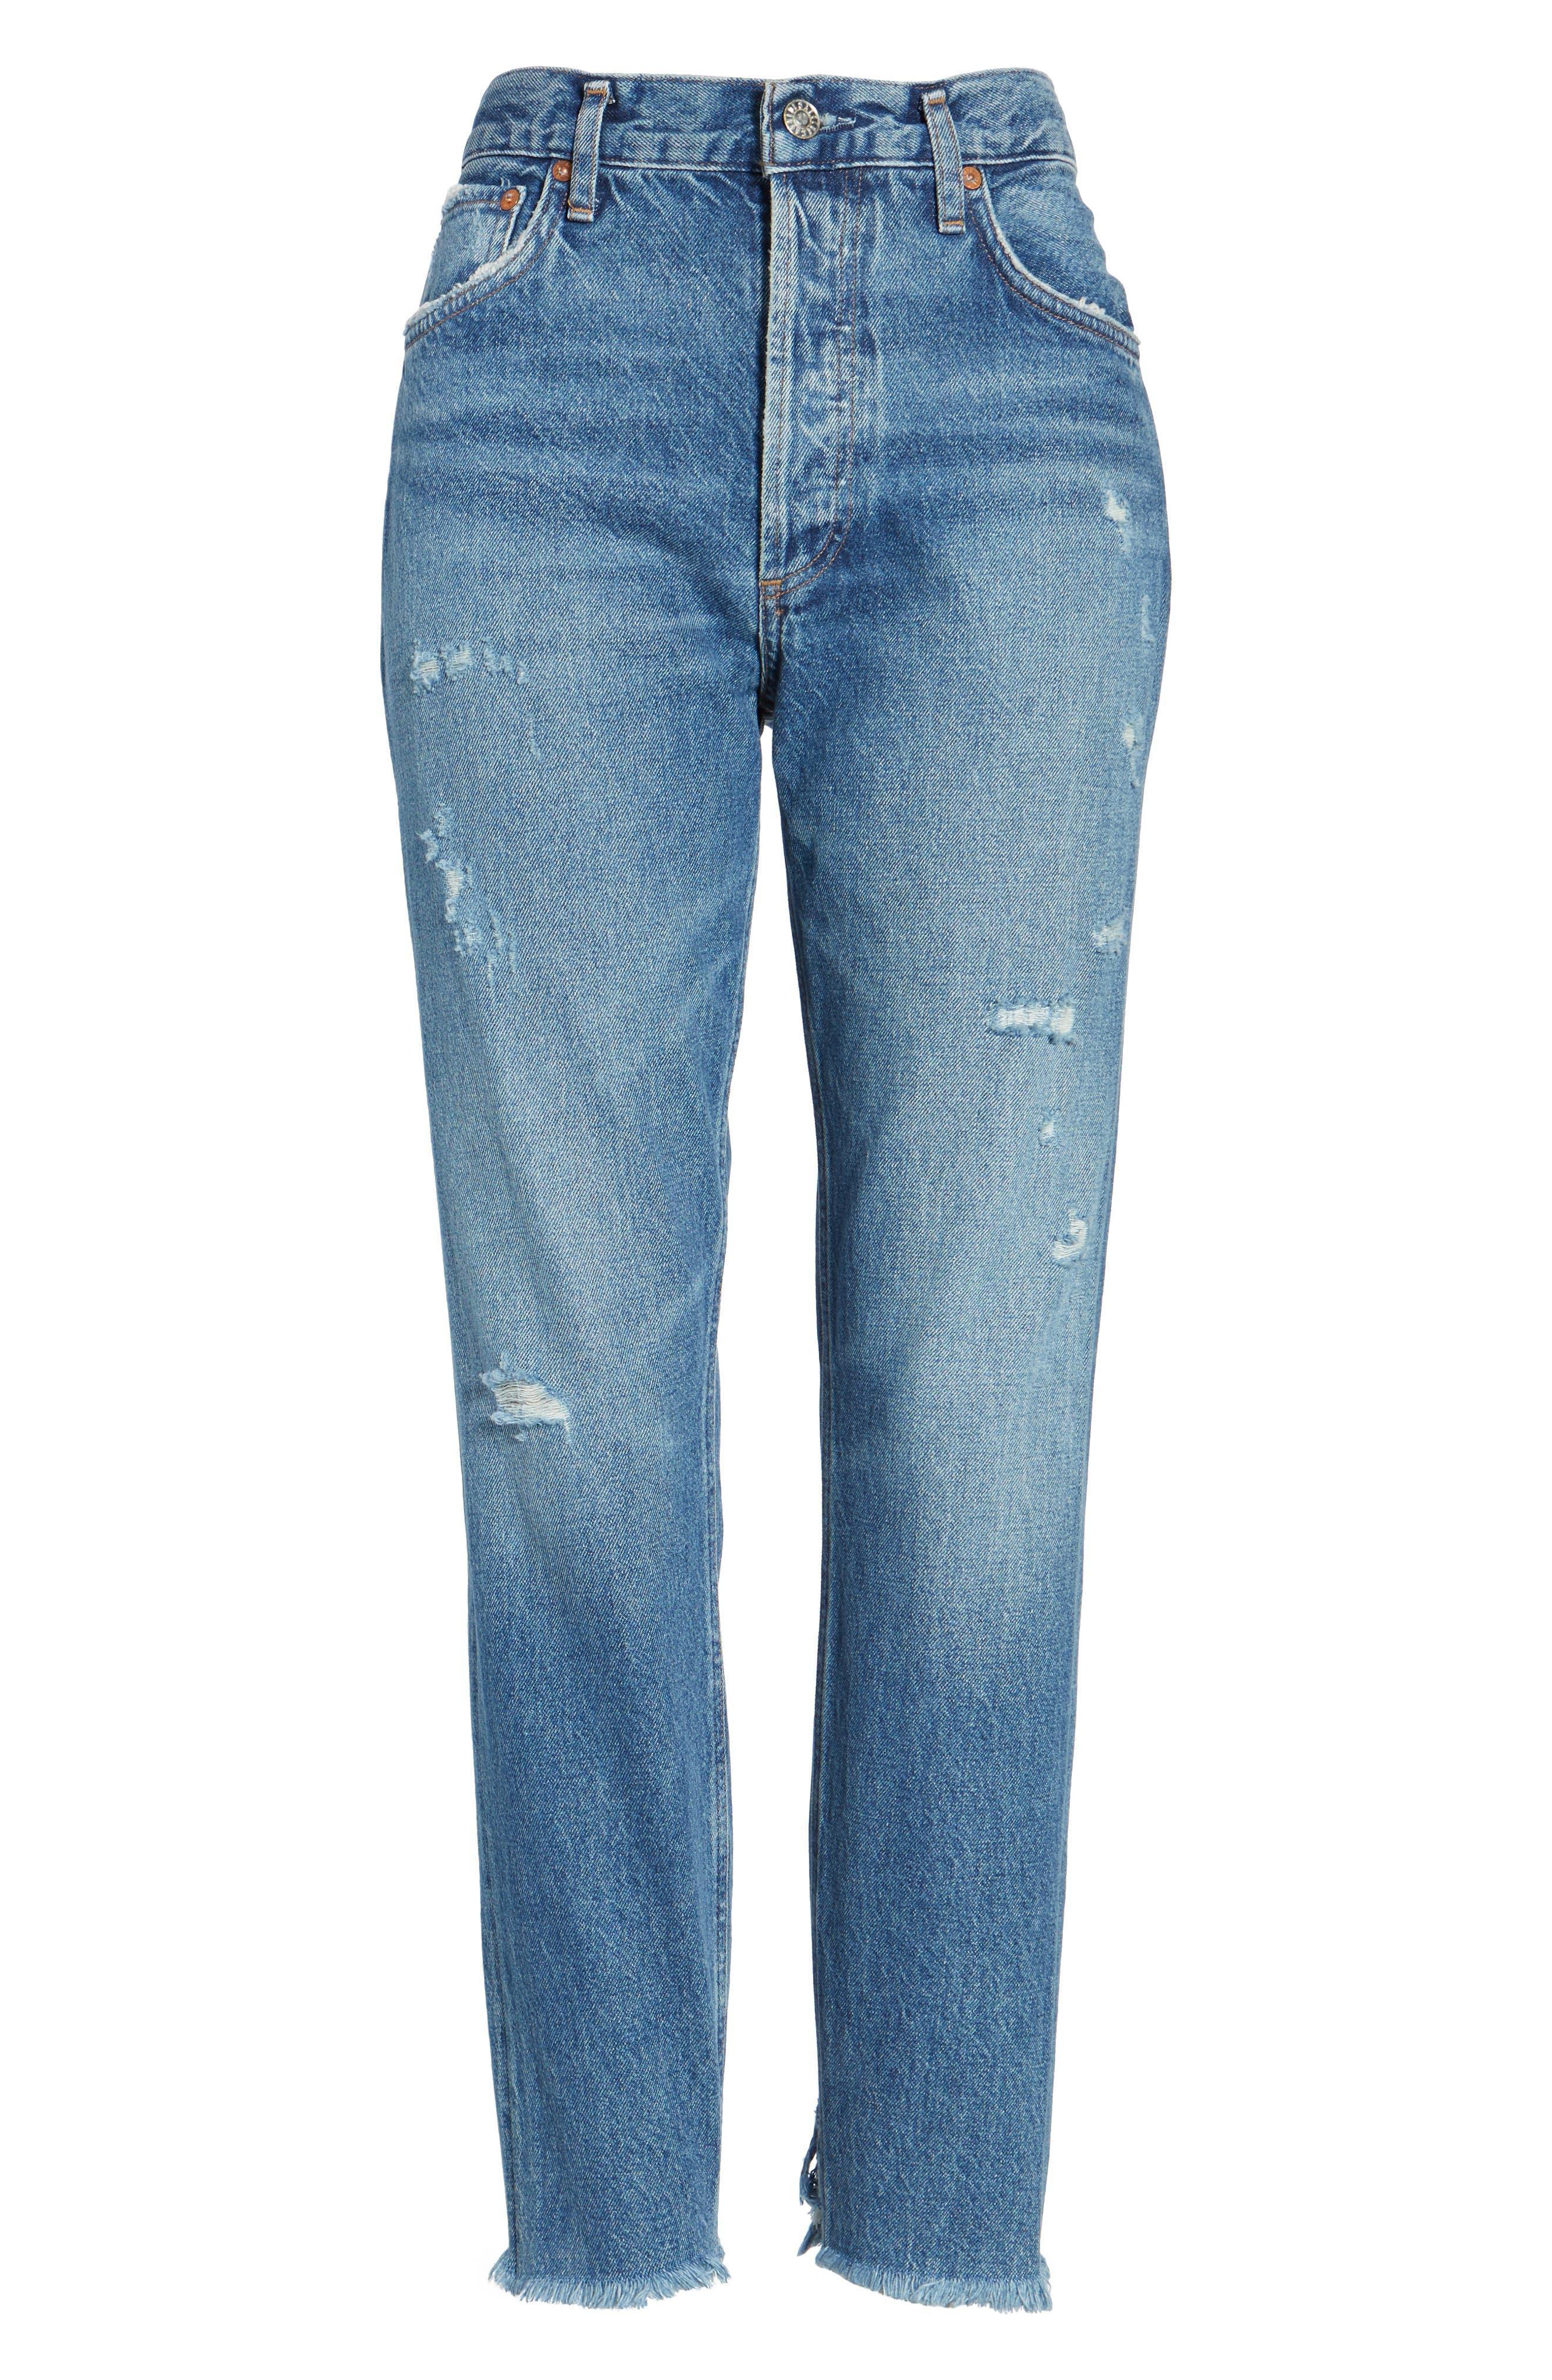 Jamie High Rise Classic Jeans,                             Alternate thumbnail 6, color,                             425